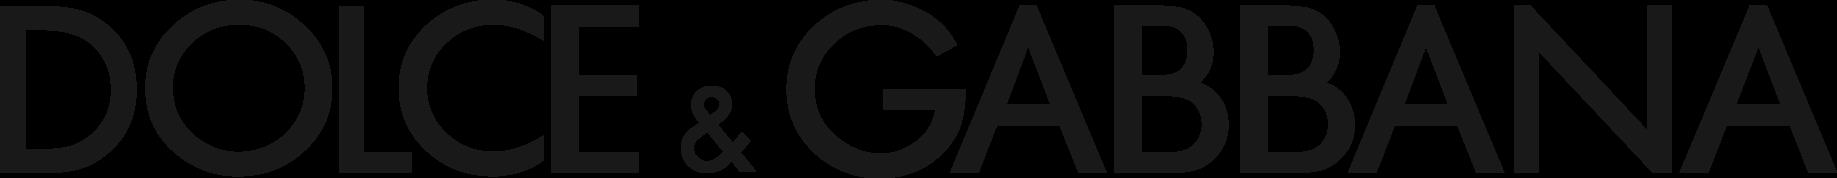 Dolce&Gabbana očalni okvirji